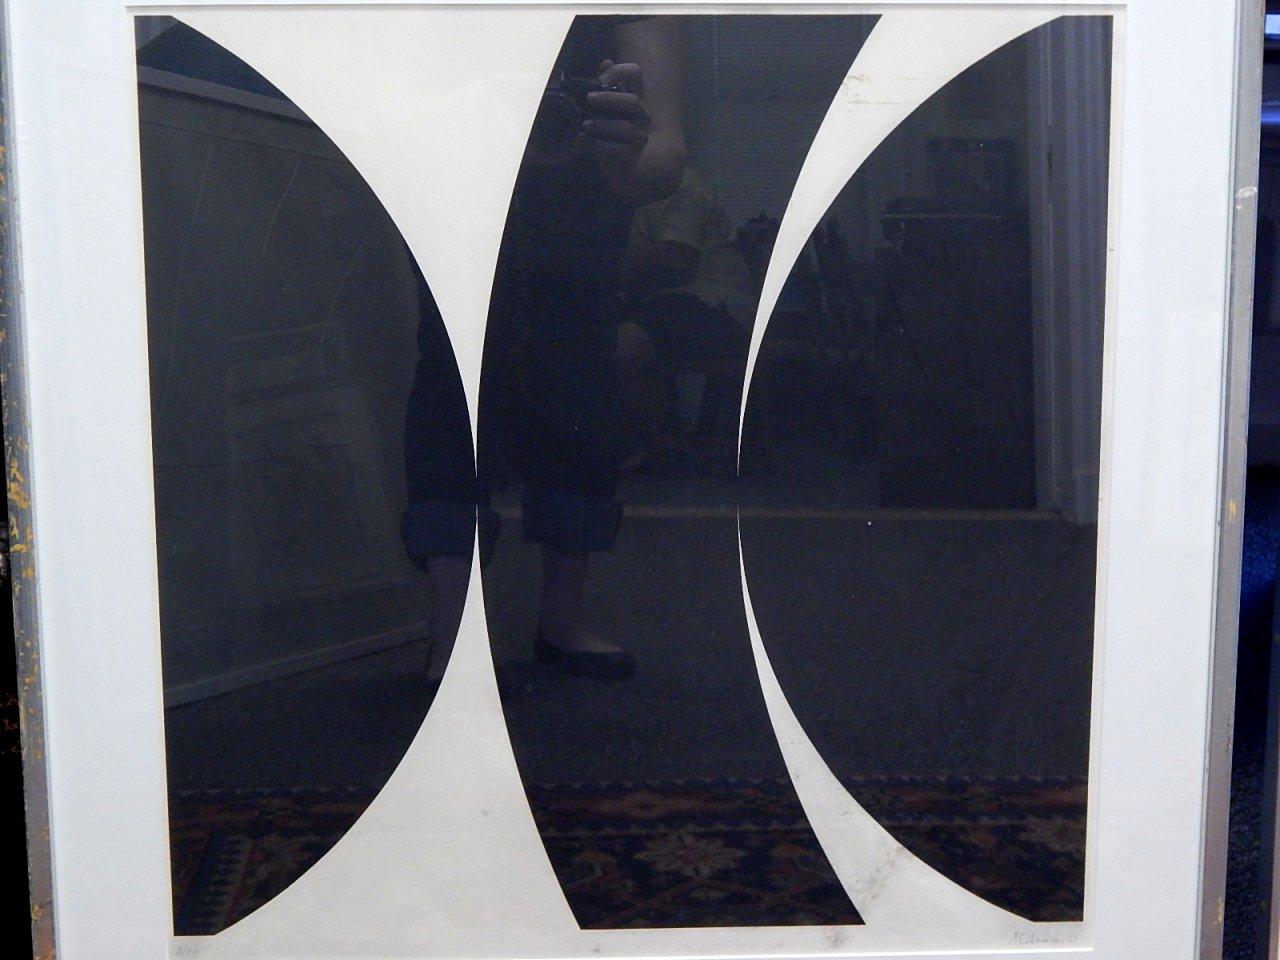 Alexander Liberman Untitled 2/30 1961